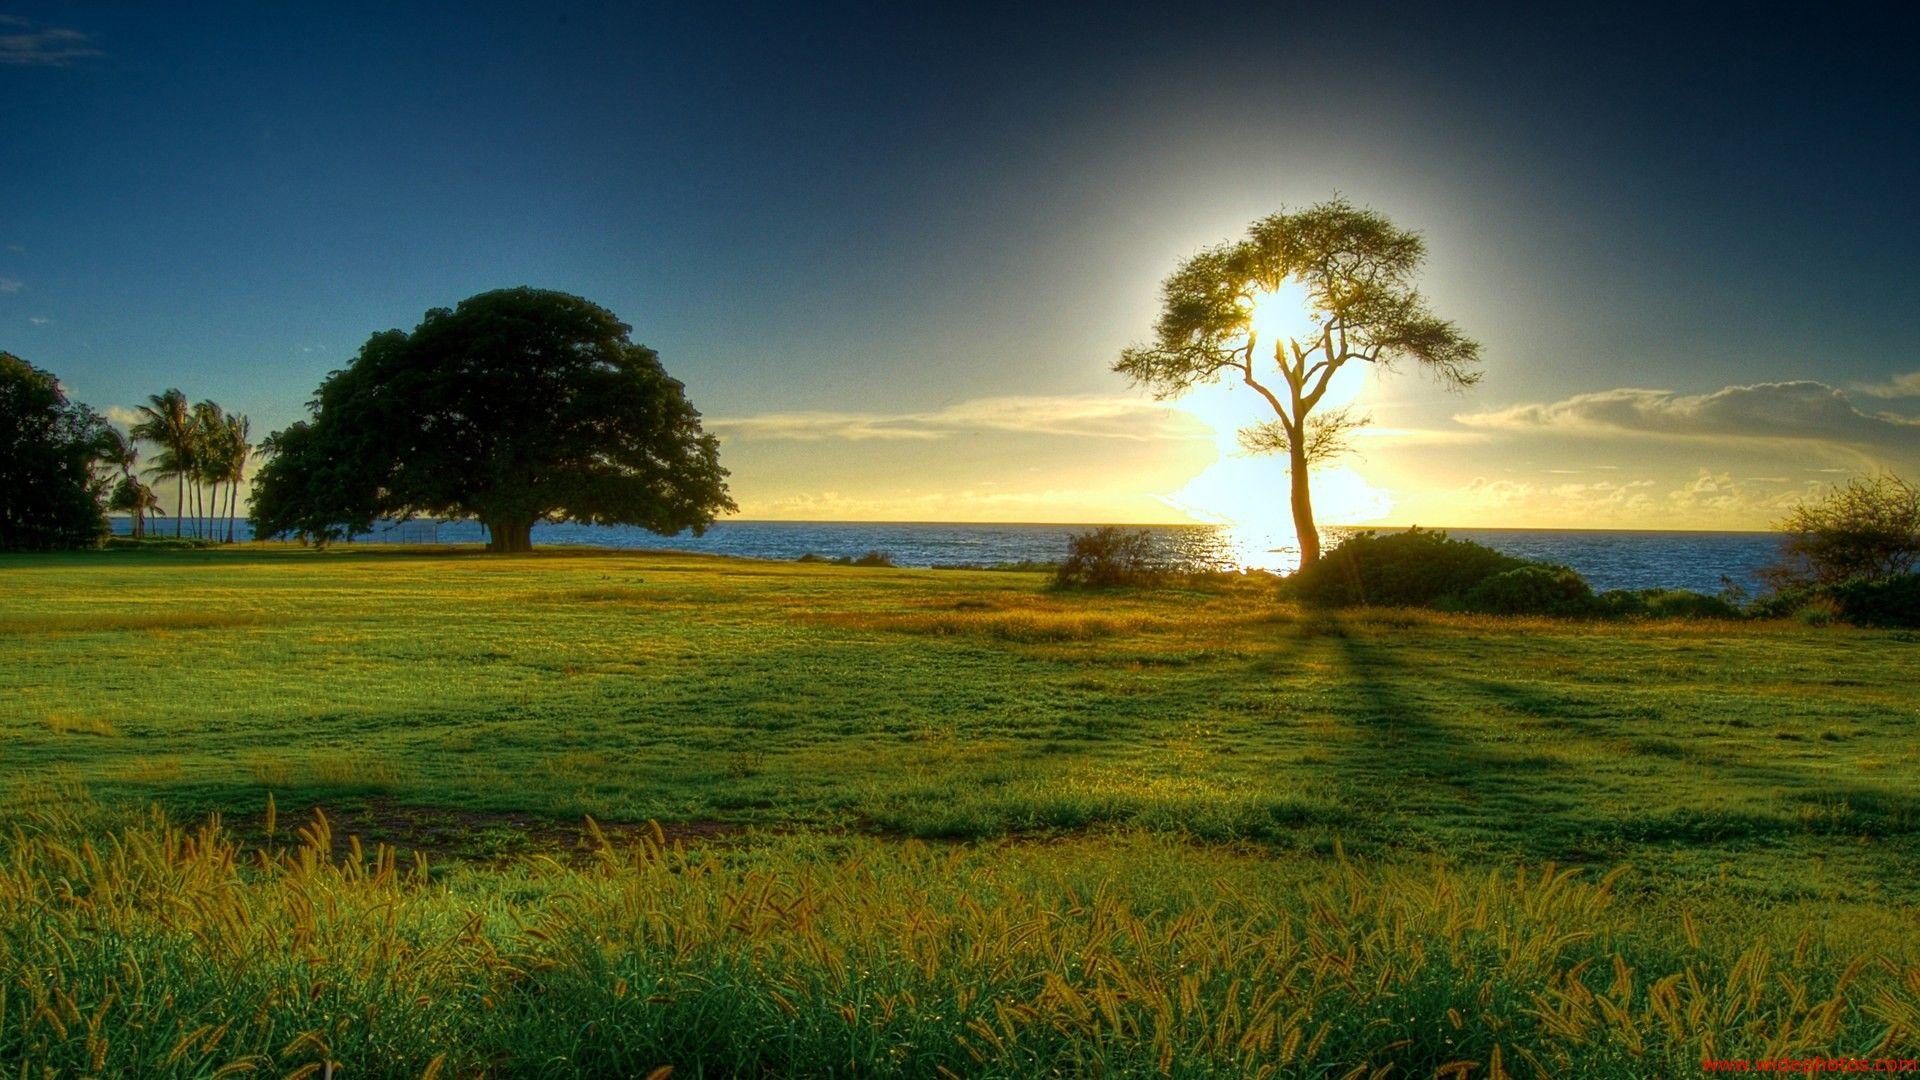 http://www.wallsave.com/wallpapers/1920x1080/scenery/499713/scenery-hd-beautiful-nature-landsacpe-wide-p-os-499713.jpg